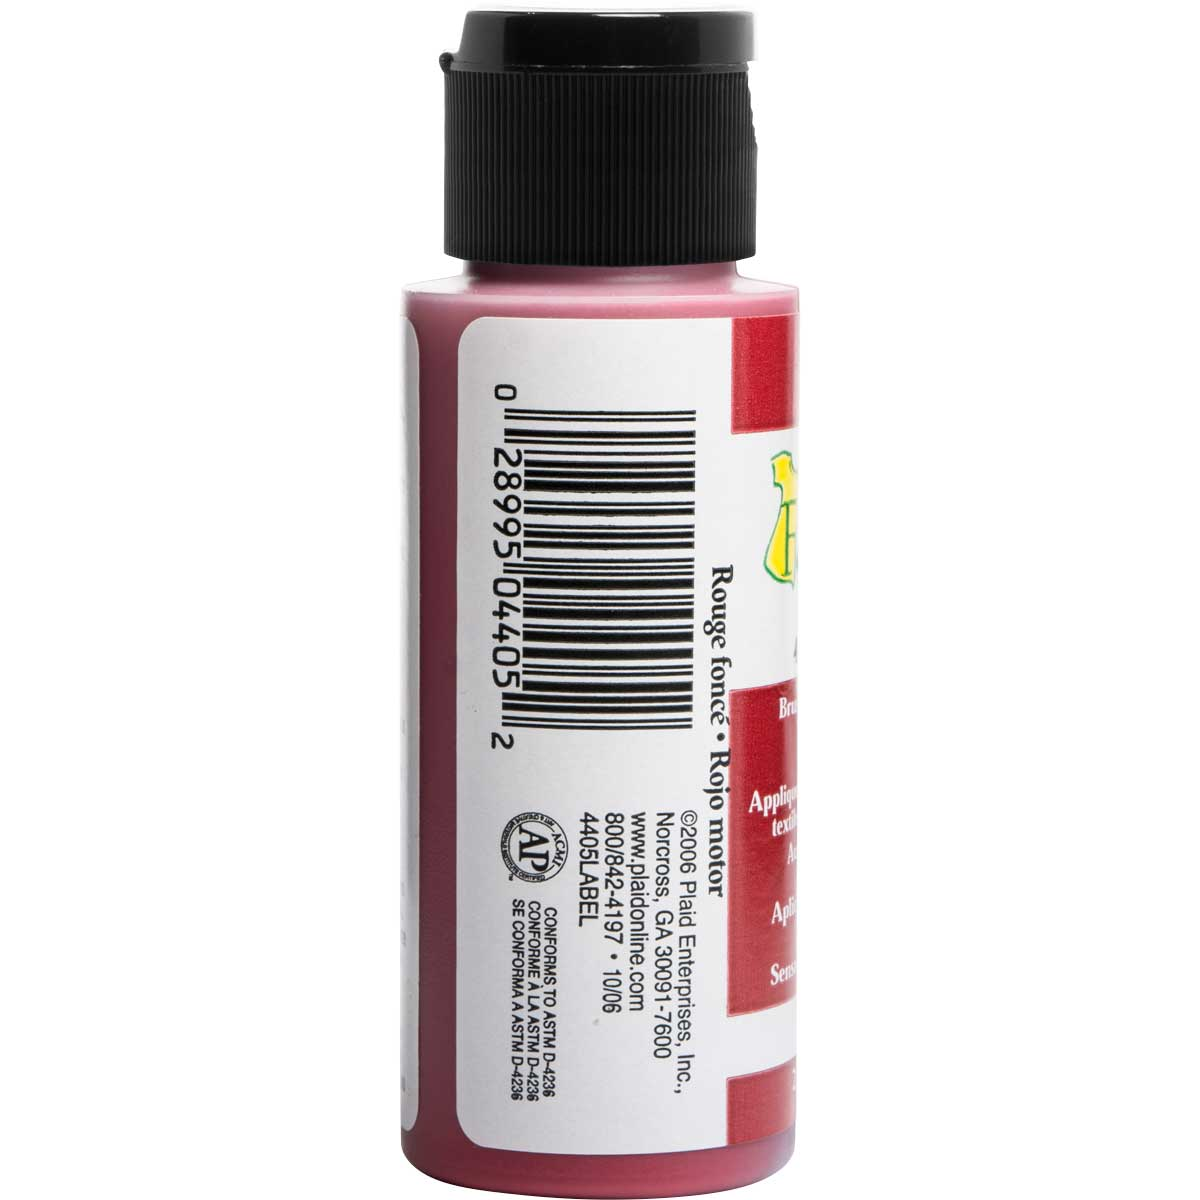 FolkArt ® Fabric™ Paint - Brush On - Engine Red